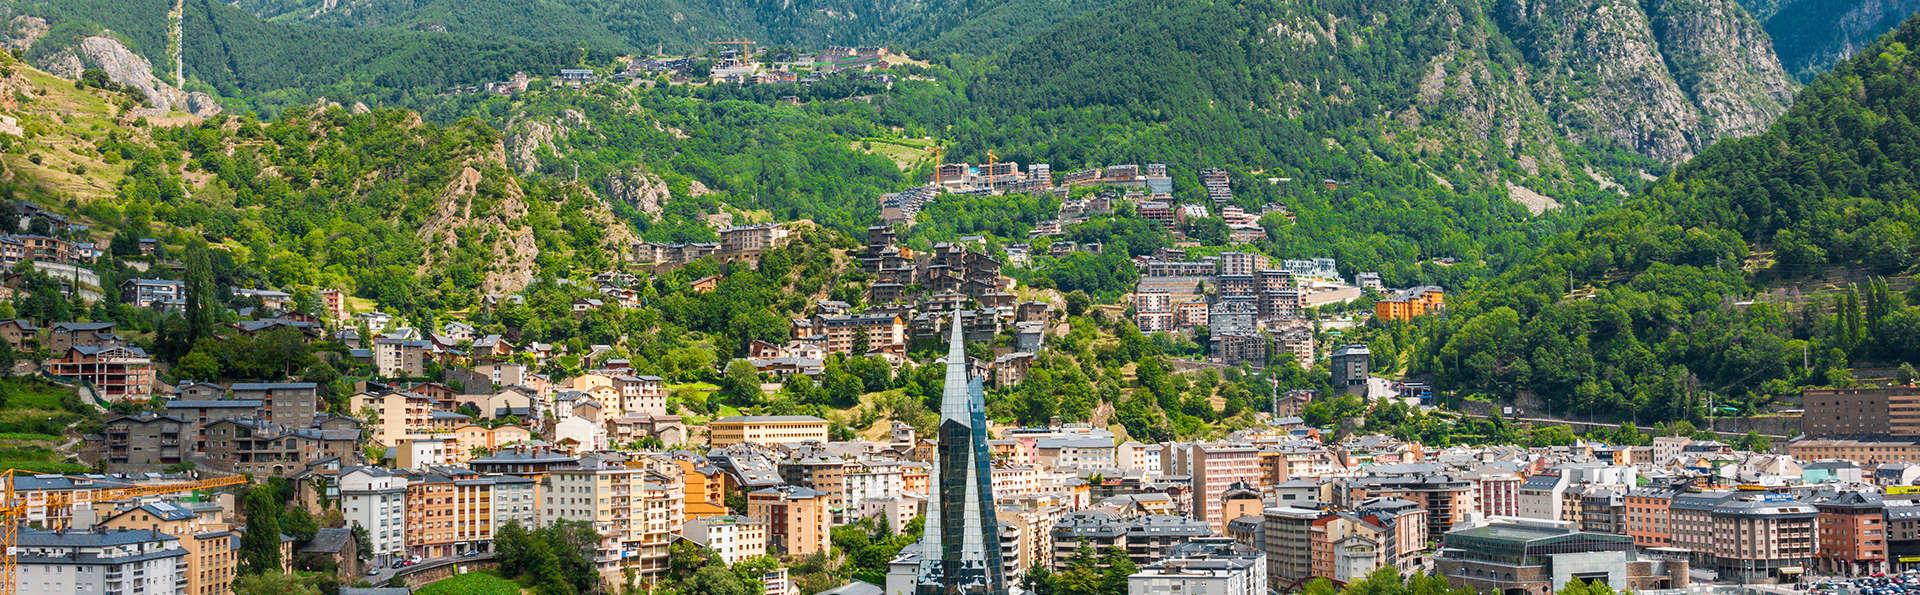 Hotel & Aparthotel SERHS Cosmos Andorra - EDIT_destination.jpg